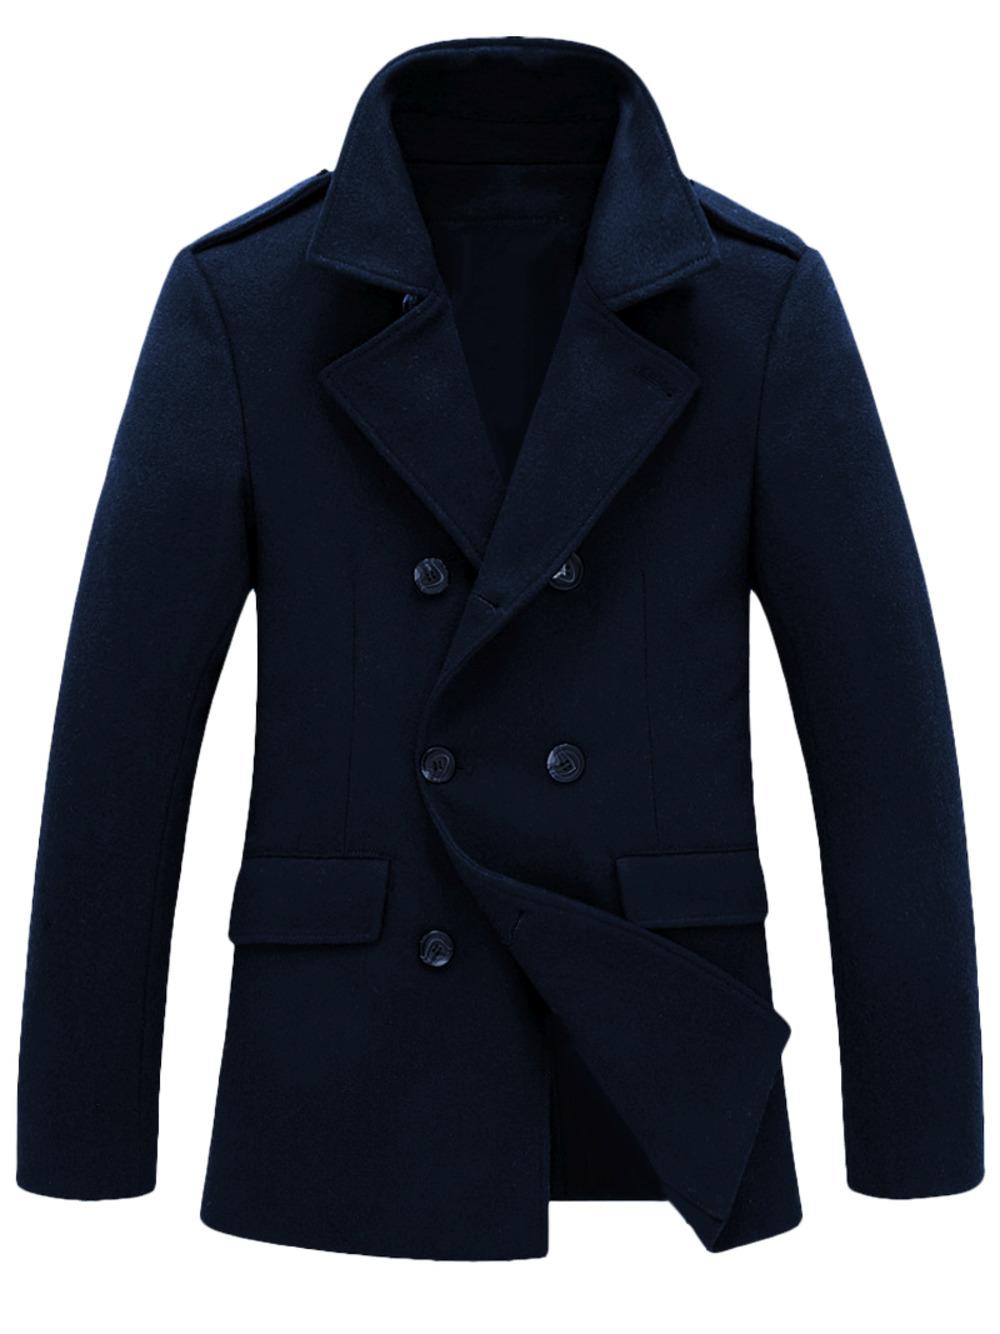 Мужское зимнее пальто арт.402